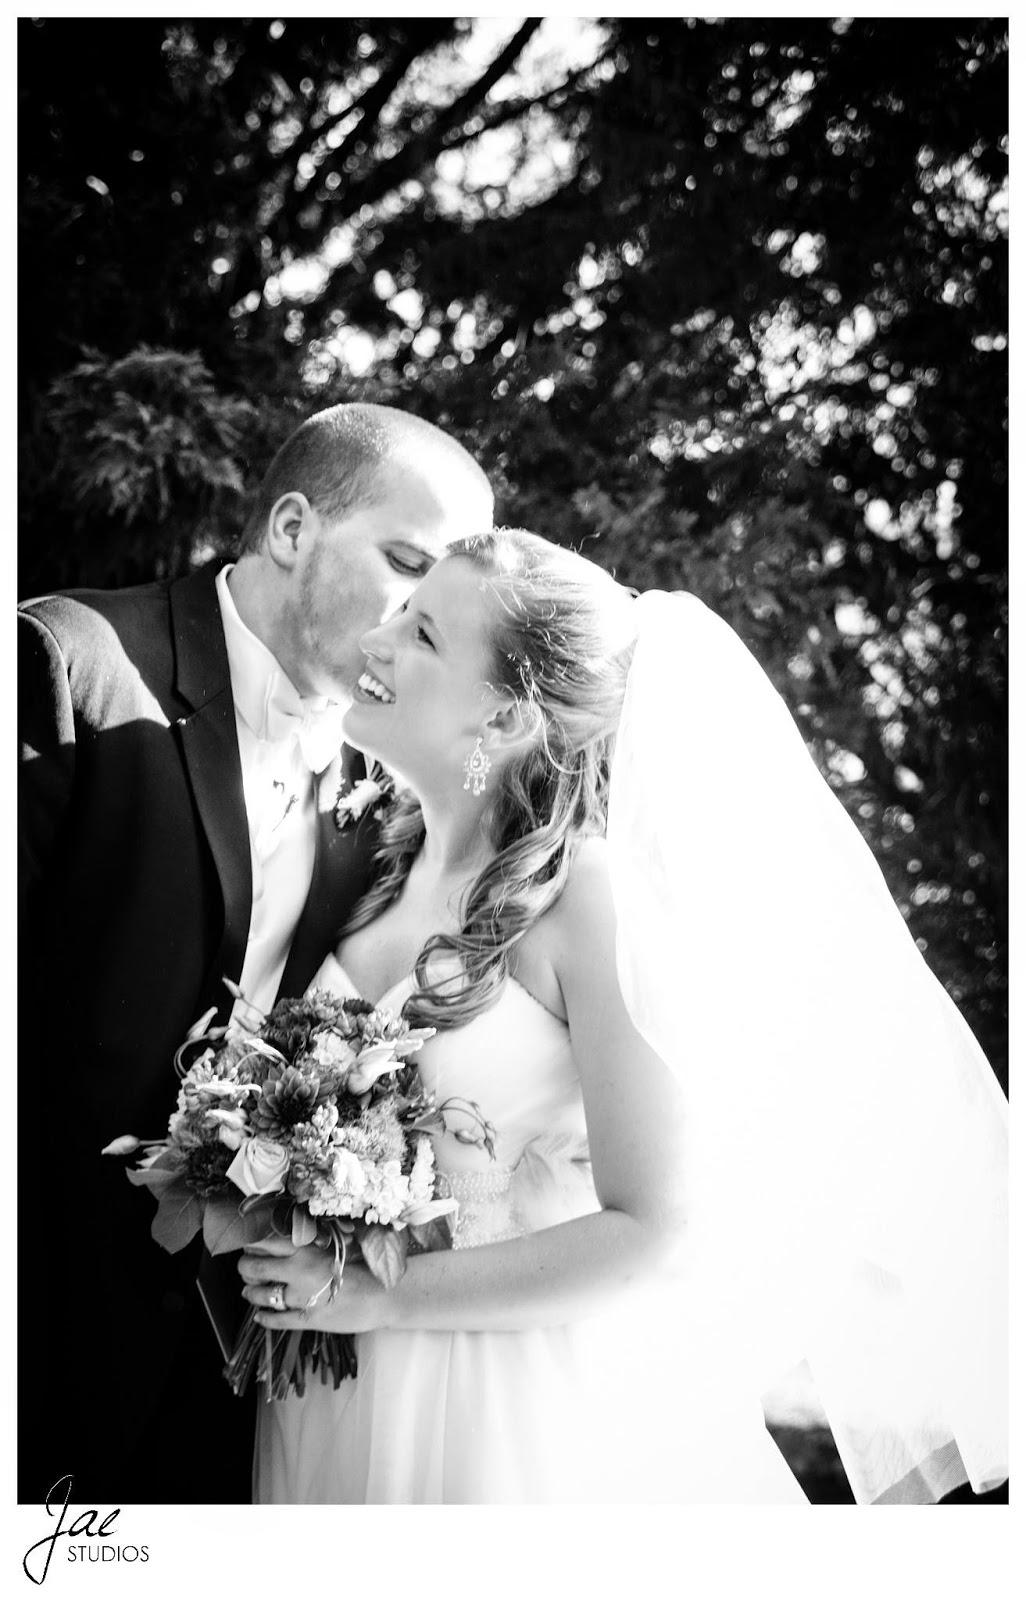 Jonathan and Julie, Bird cage, West Manor Estate, Wedding, Lynchburg, Virginia, Jae Studios, wedding dress, veil, groom, bride, laughing, kiss, flowers, bouquet, black and white